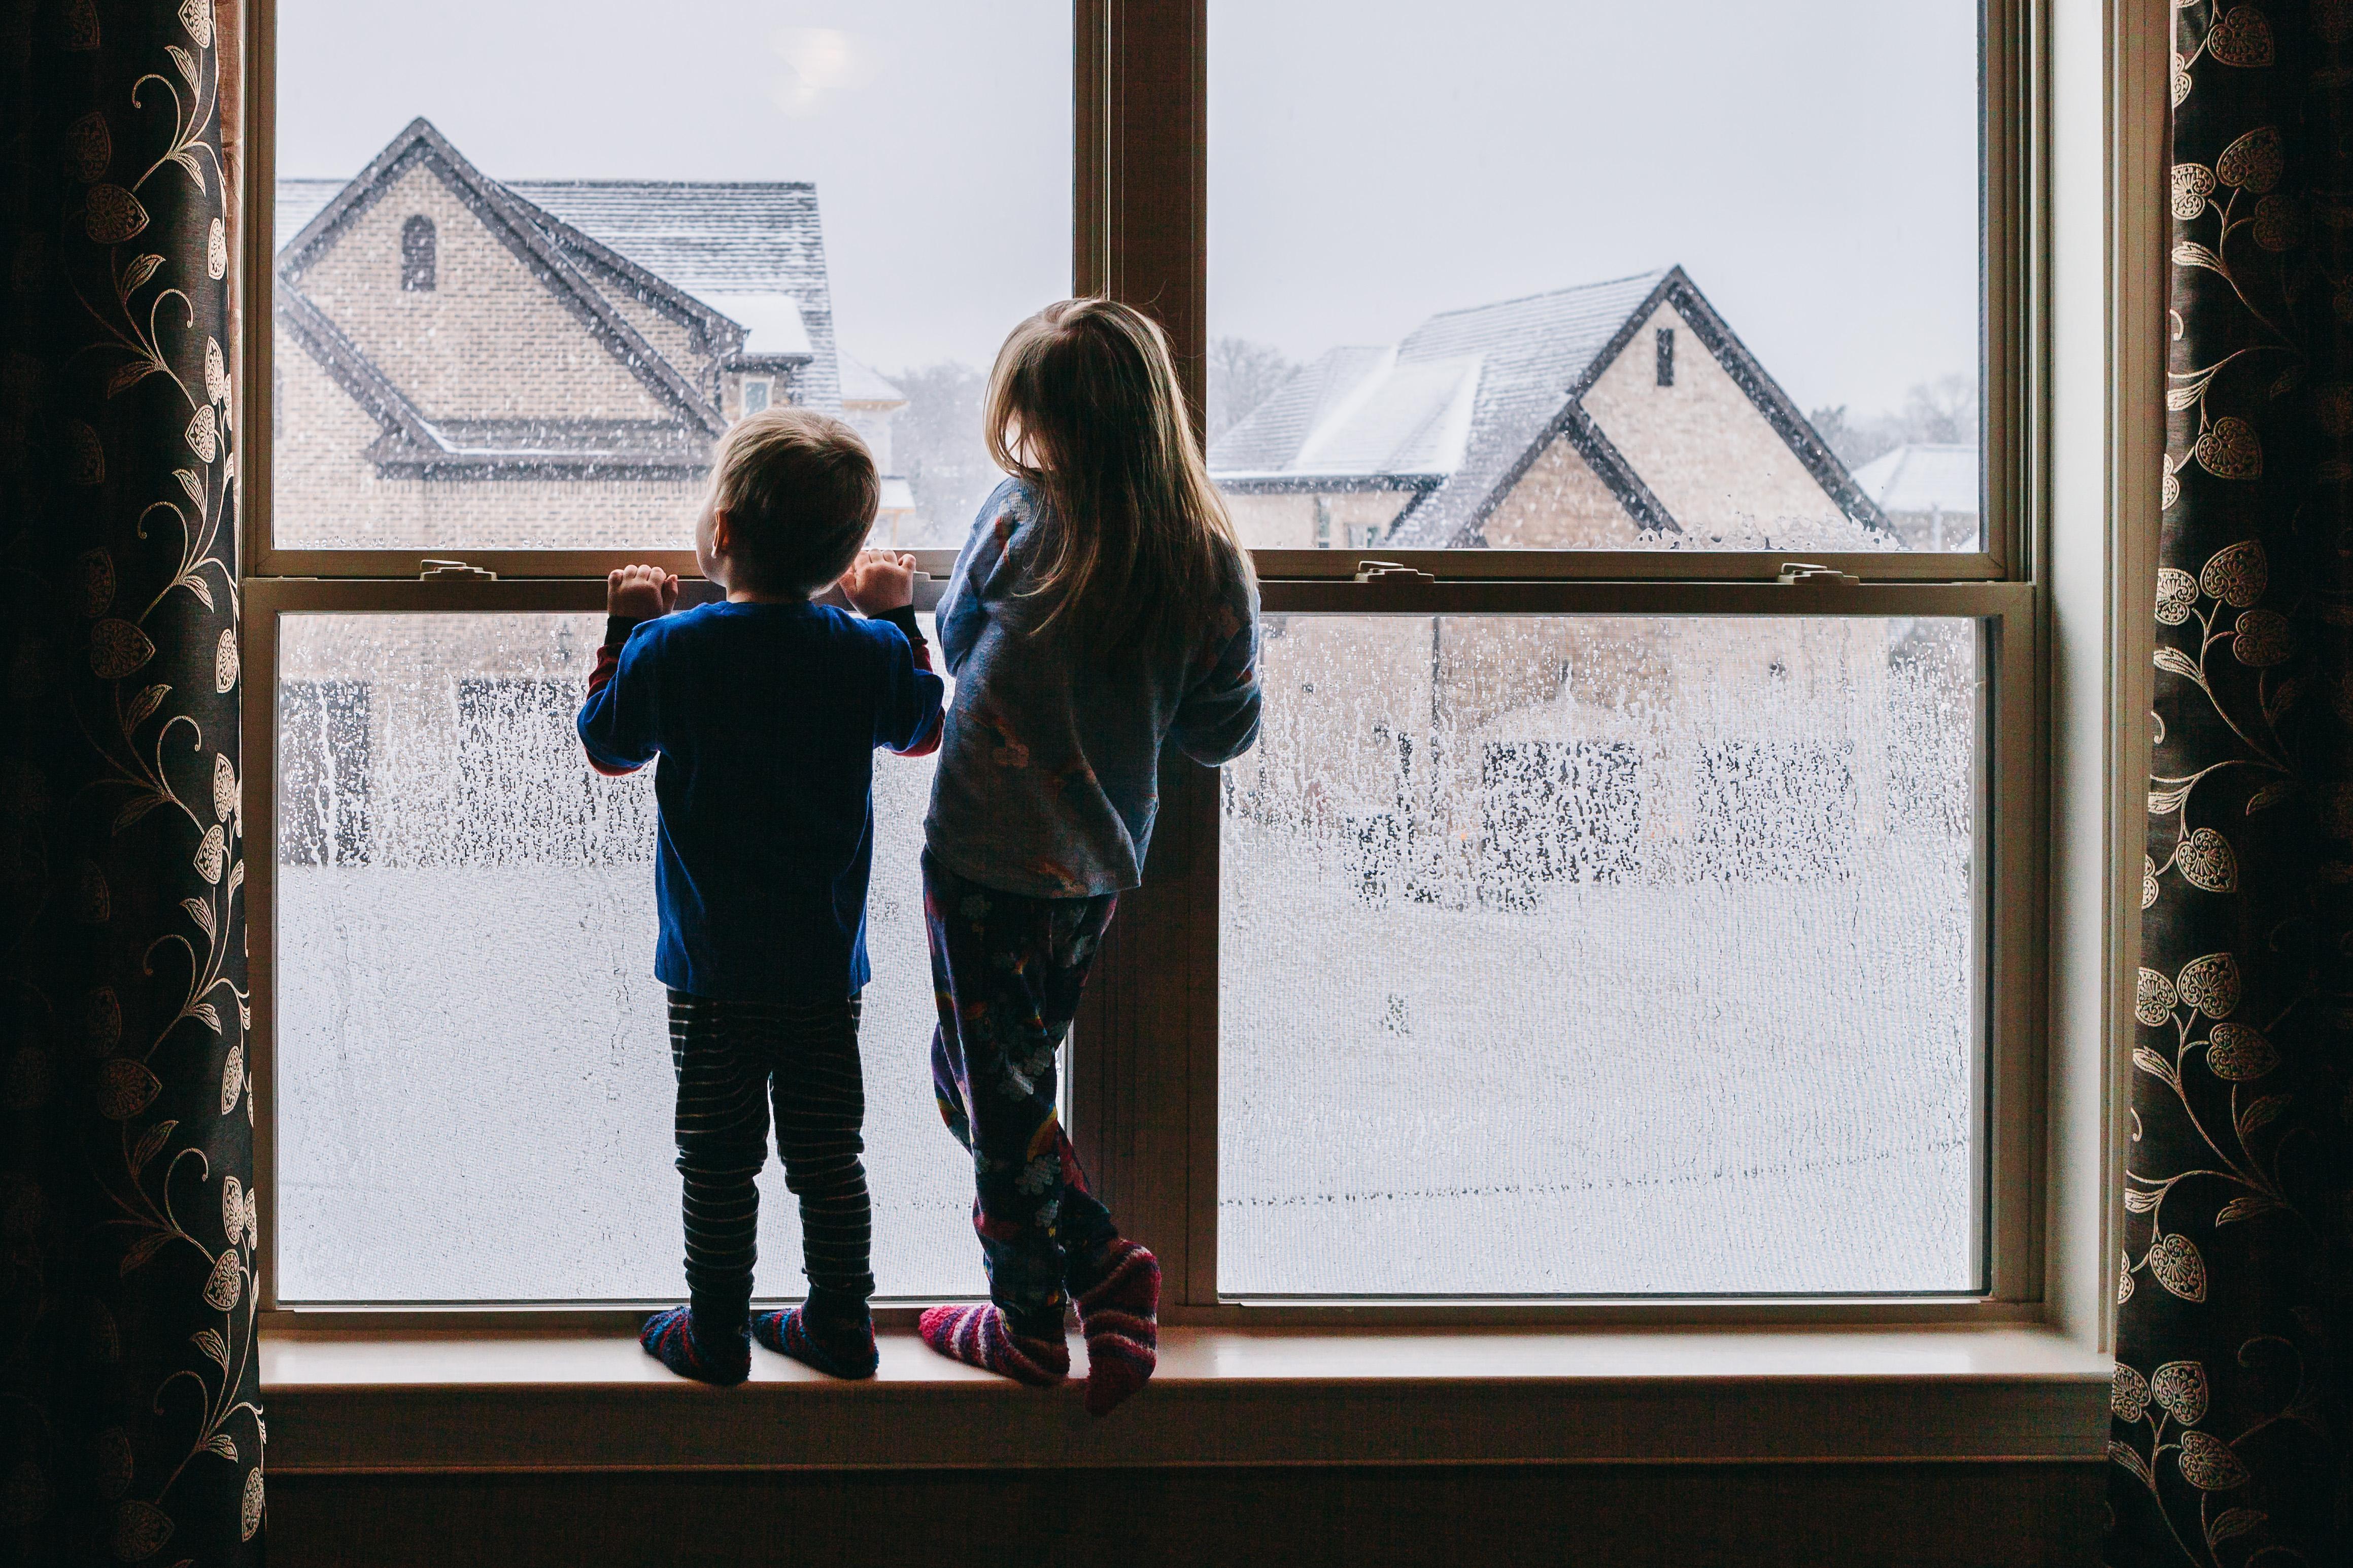 kids_window_wonderland_snow_jasondelkou